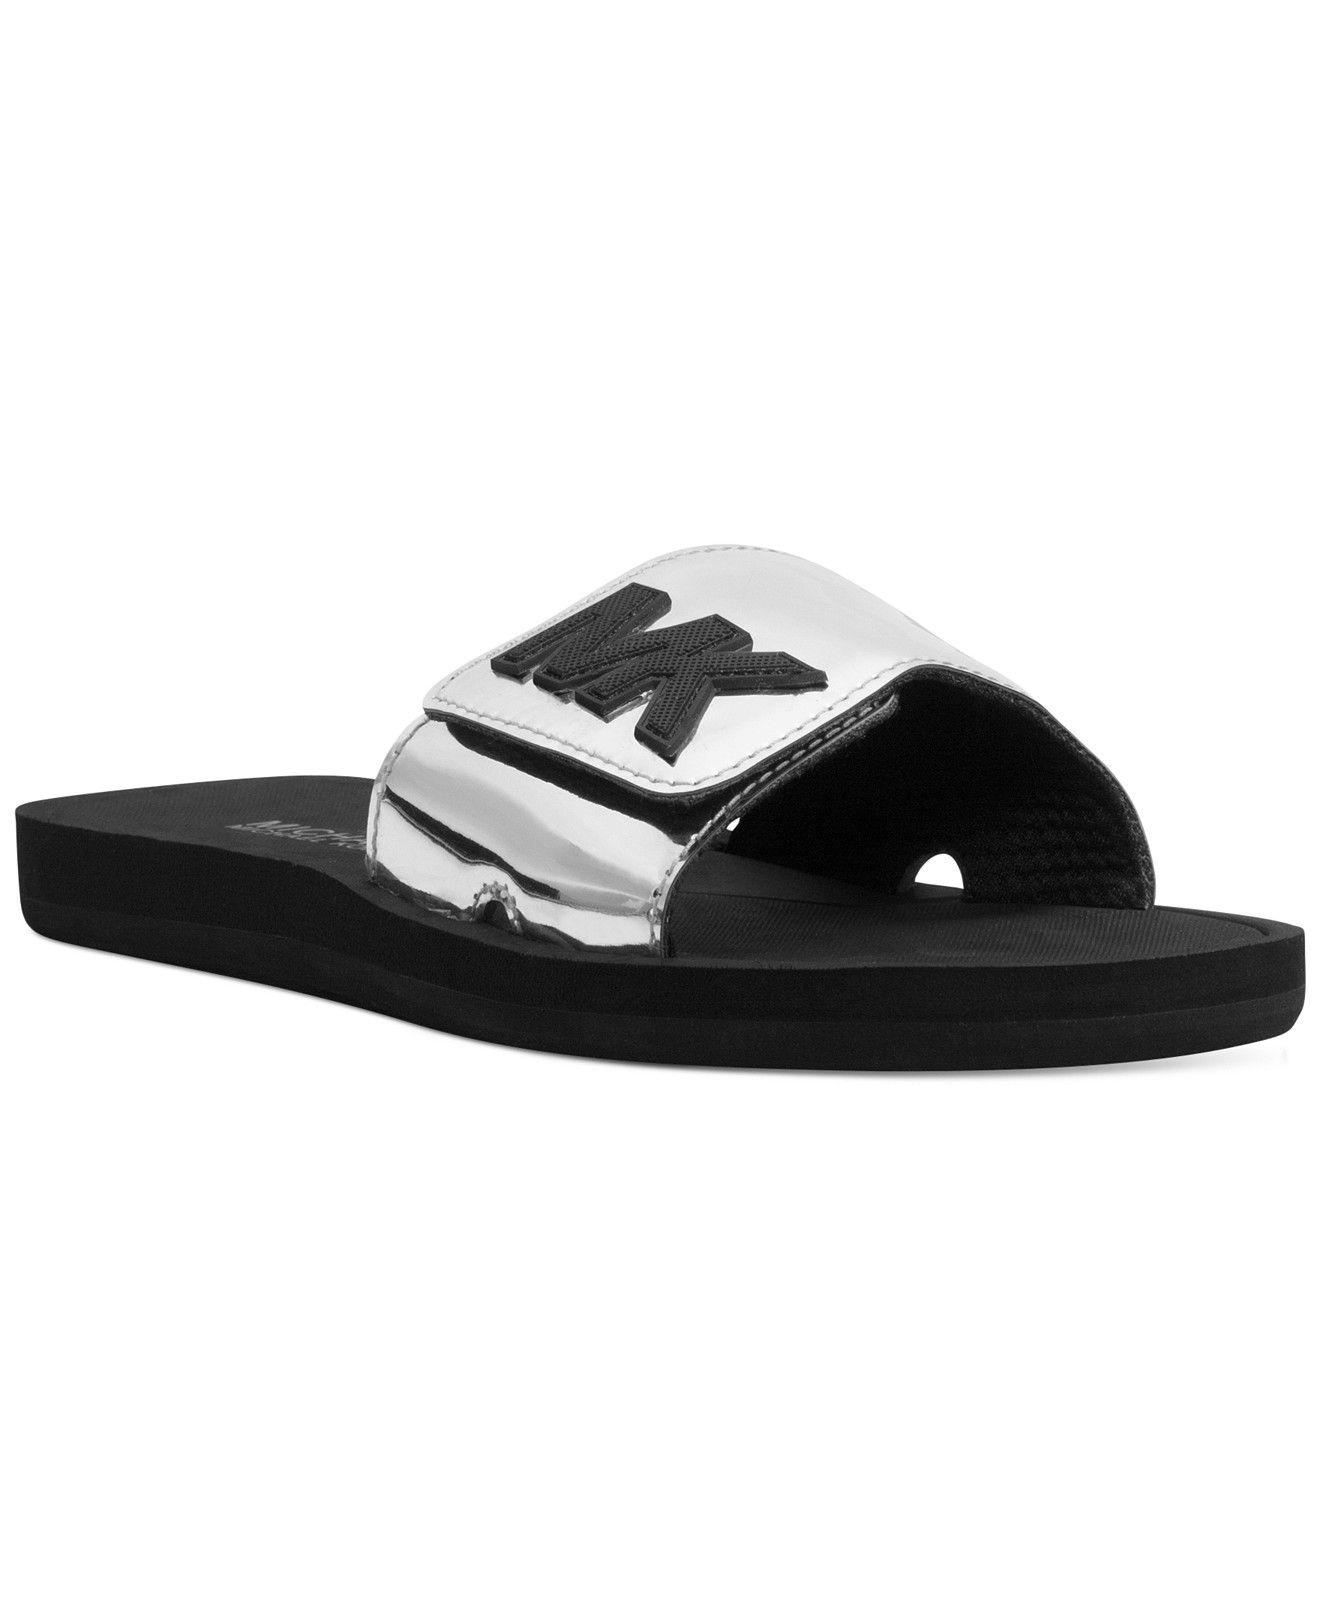 Black sandals michael kors - Michael Michael Kors Mk Shower Slide Sandals